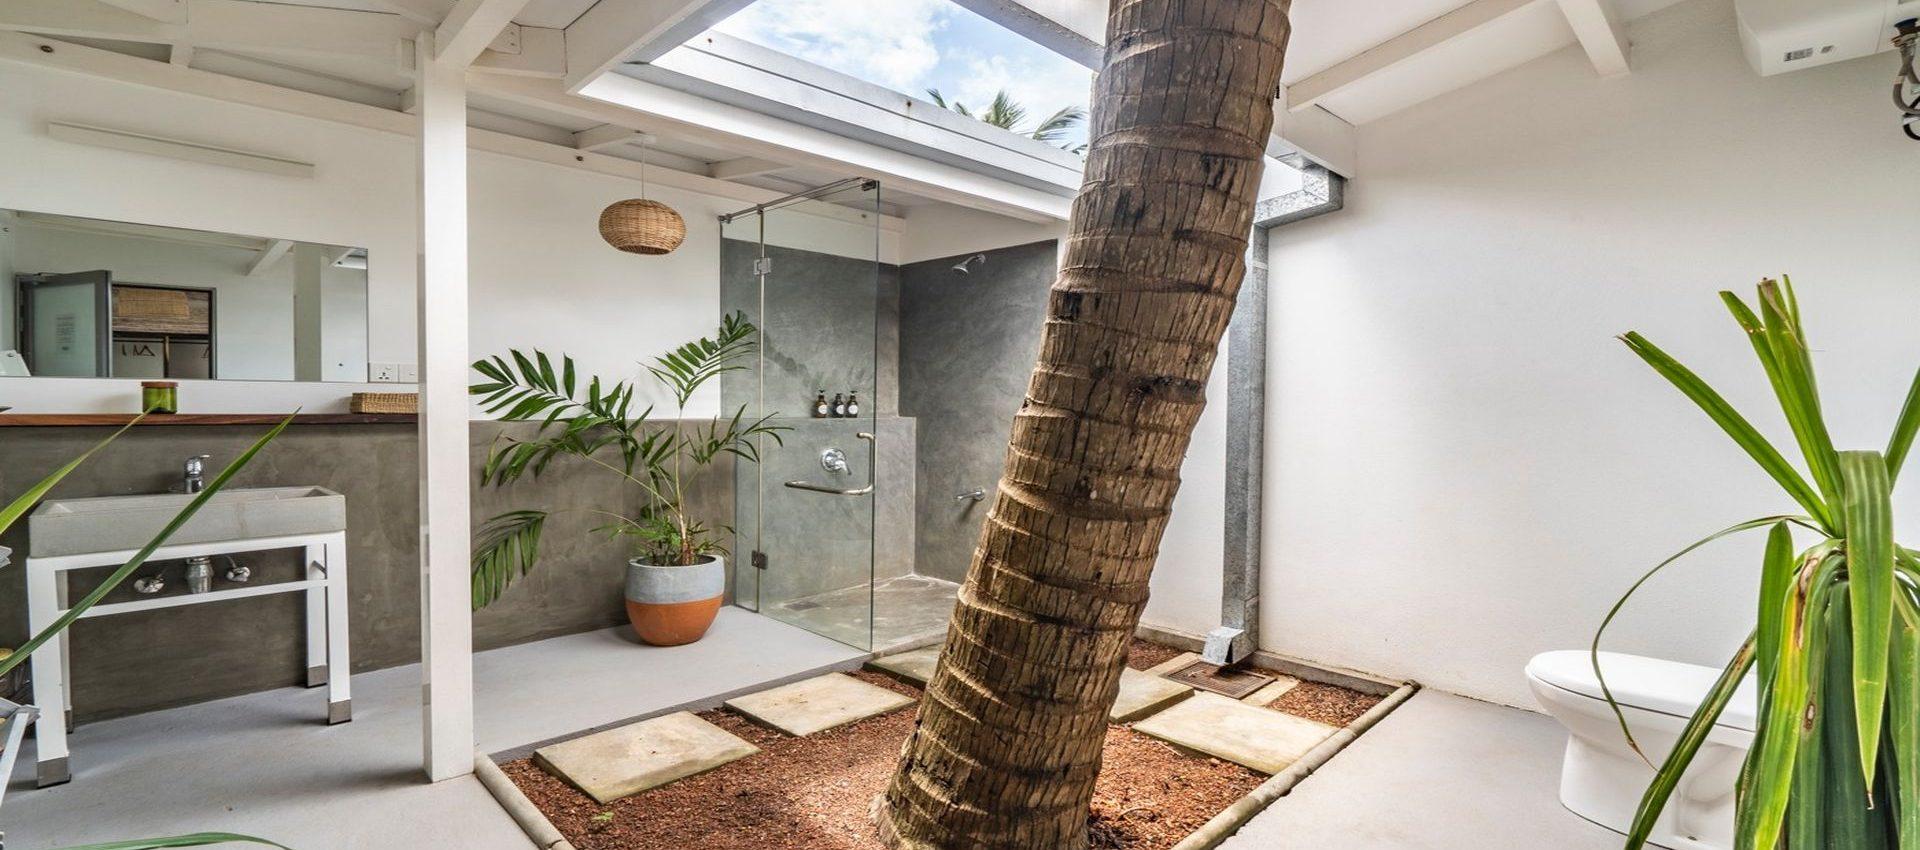 Private open air bathrooms